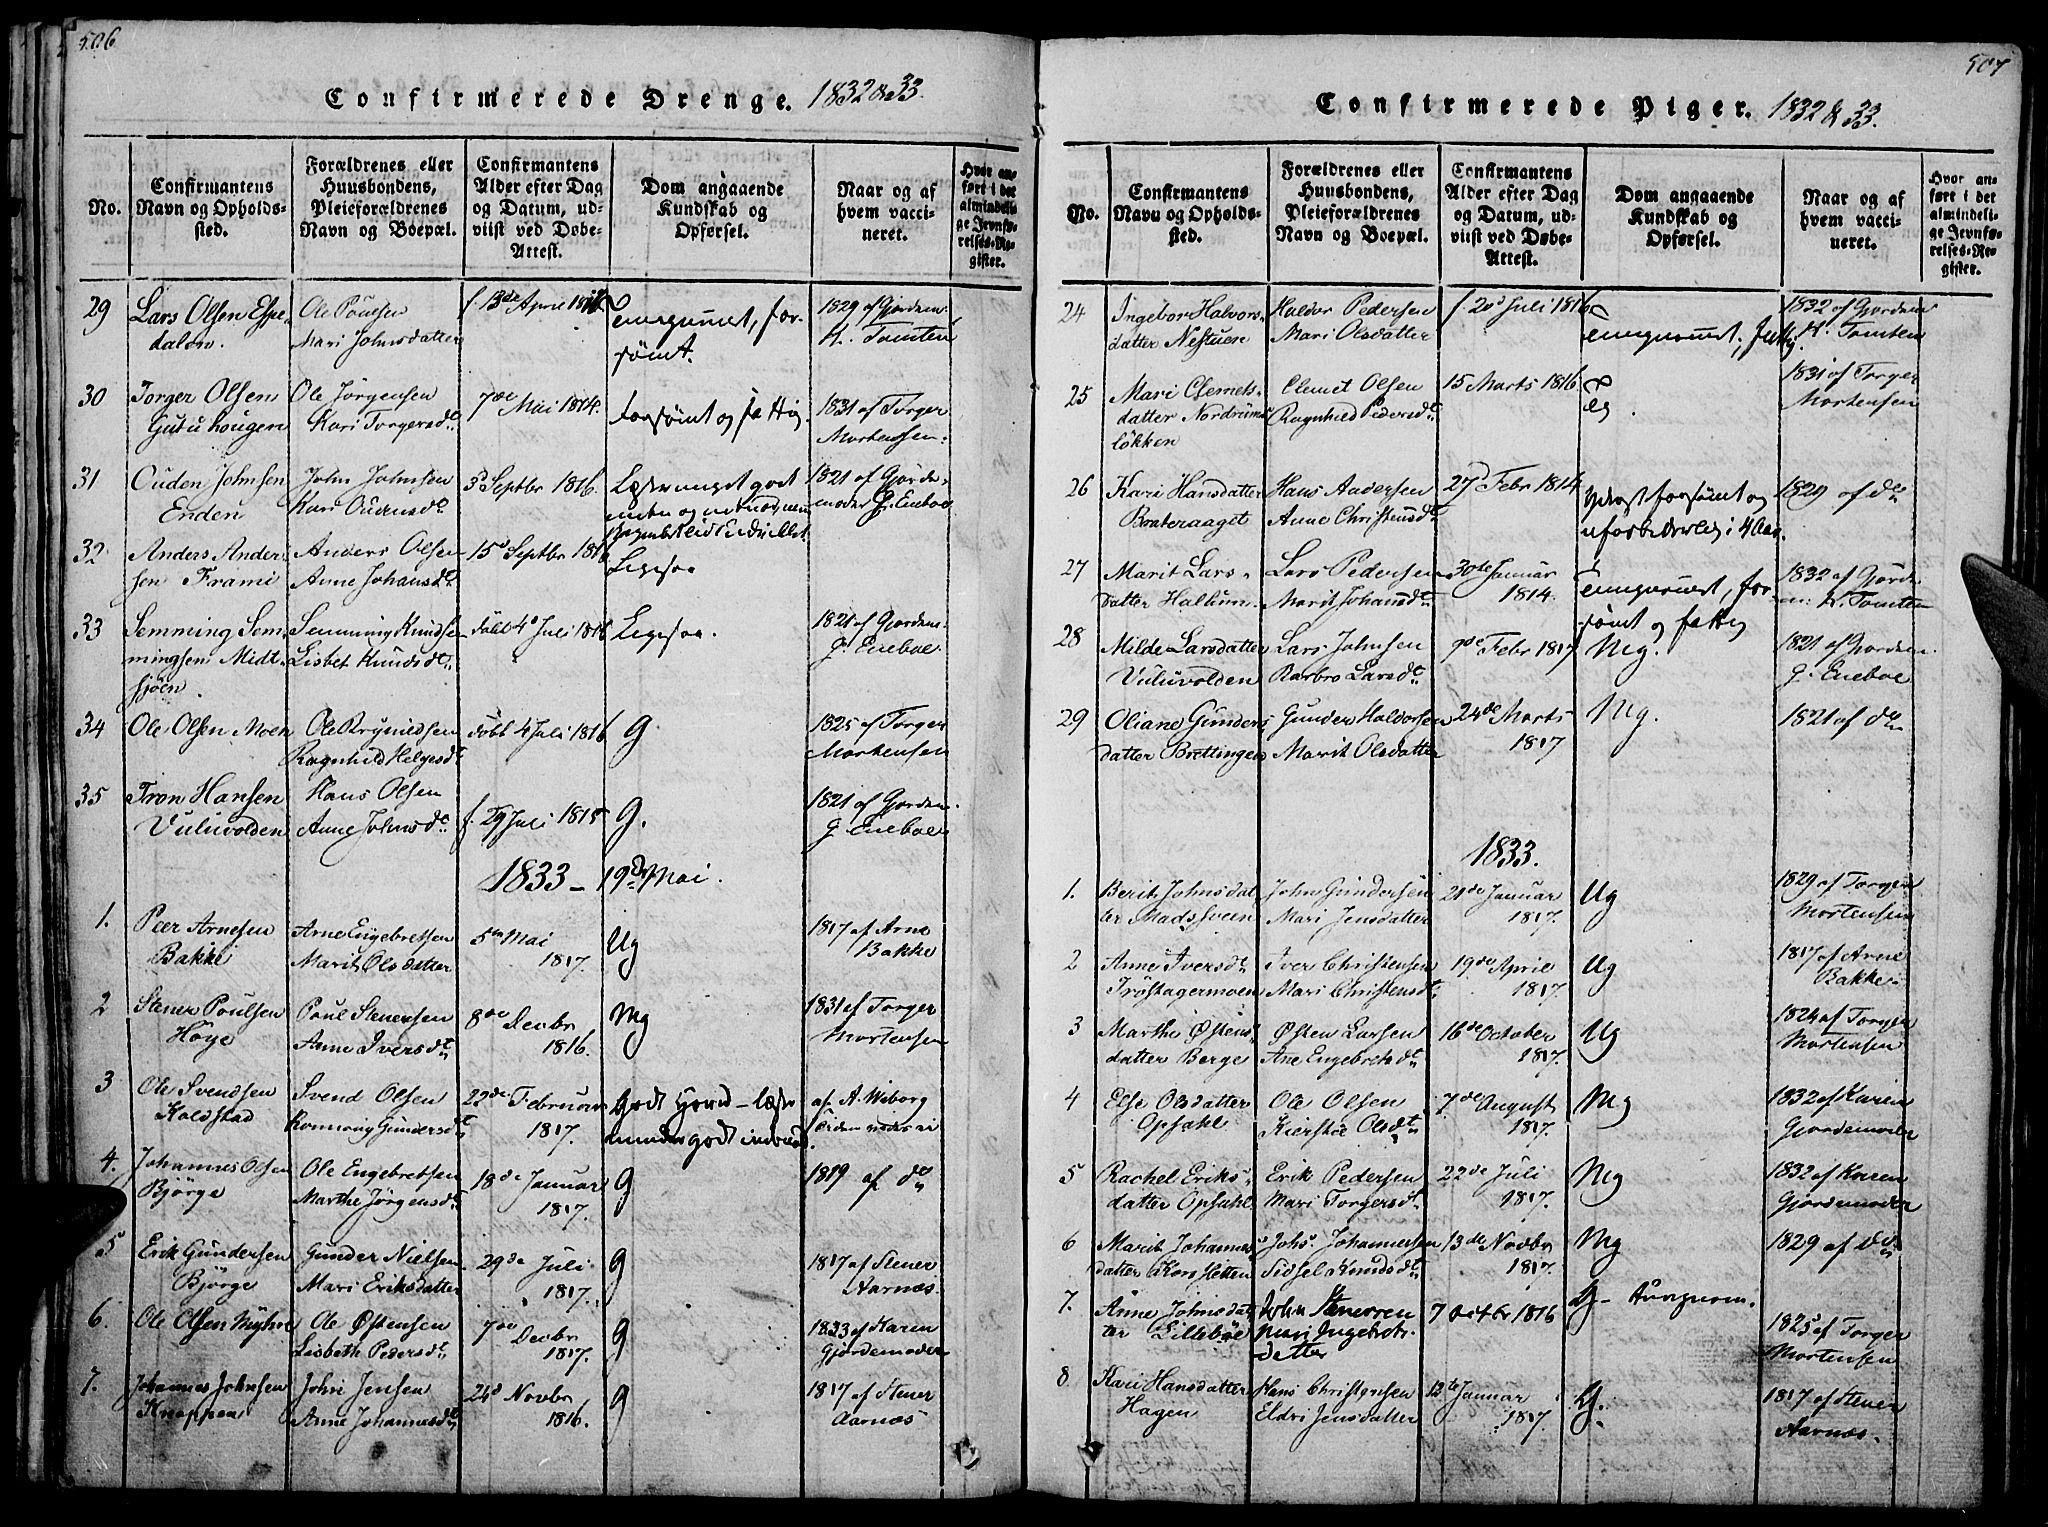 SAH, Ringebu prestekontor, Ministerialbok nr. 4, 1821-1839, s. 506-507